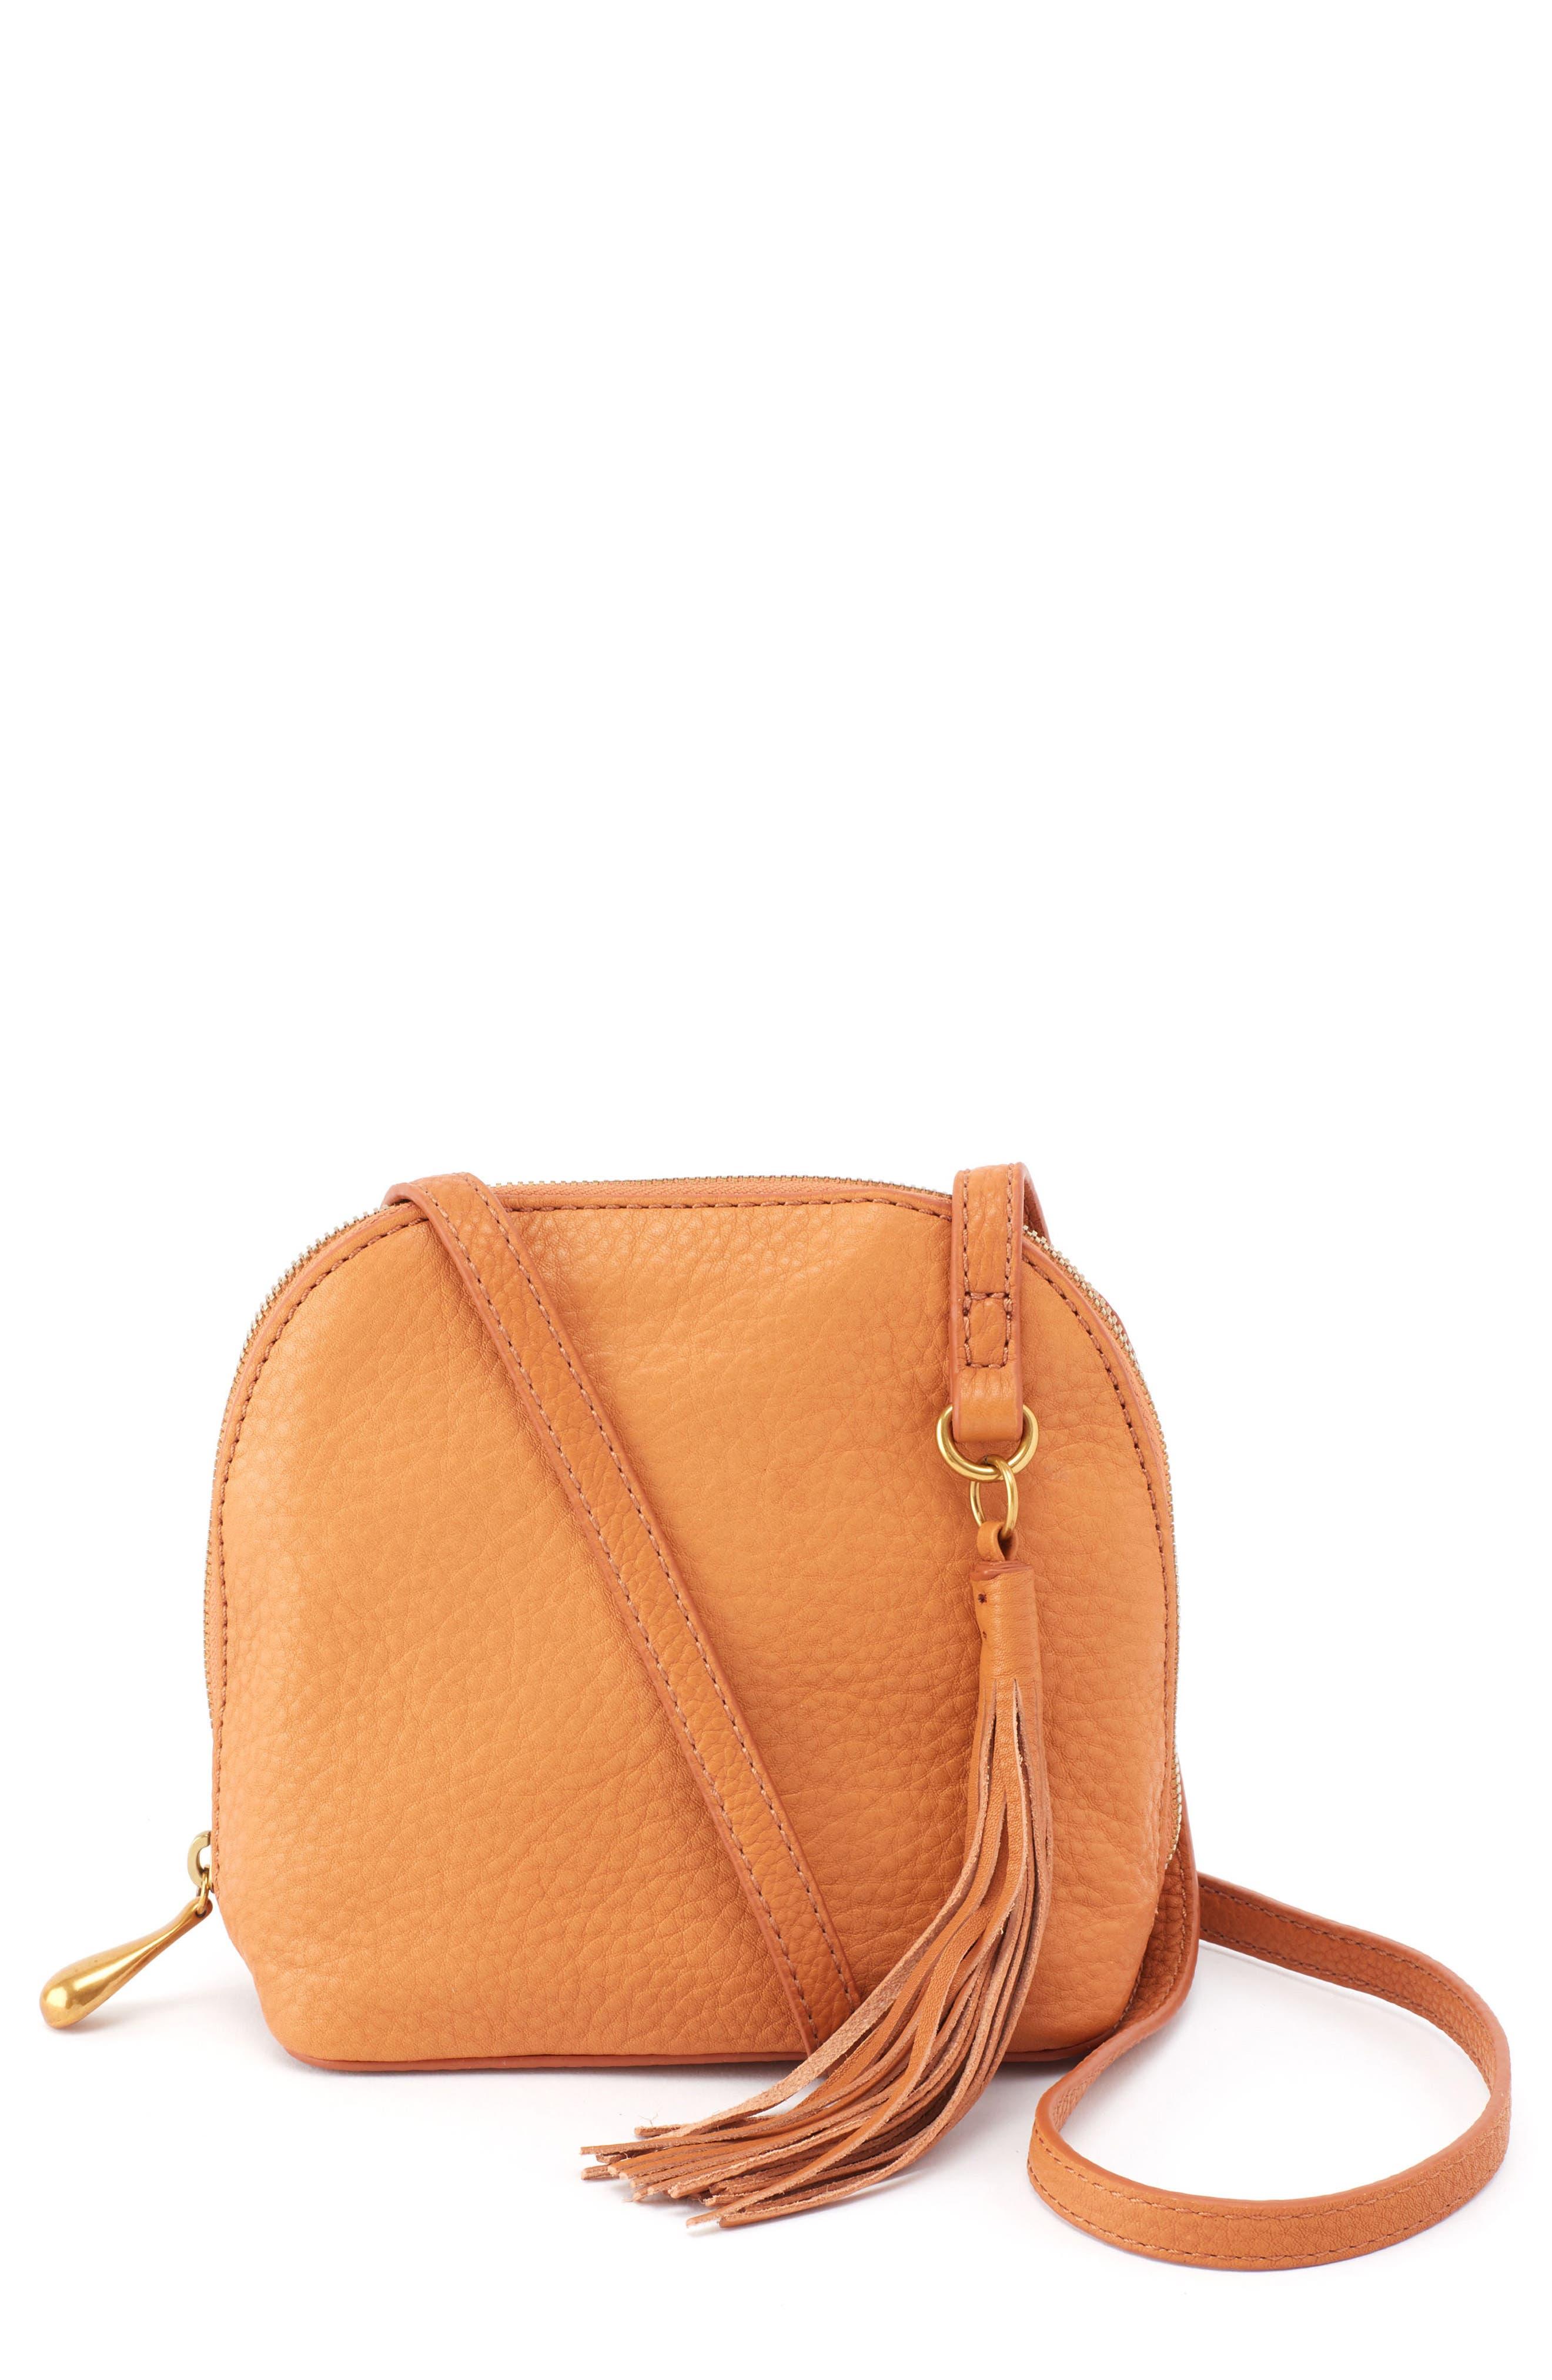 HOBO, Nash Calfskin Leather Crossbody Bag, Main thumbnail 1, color, WHISKEY